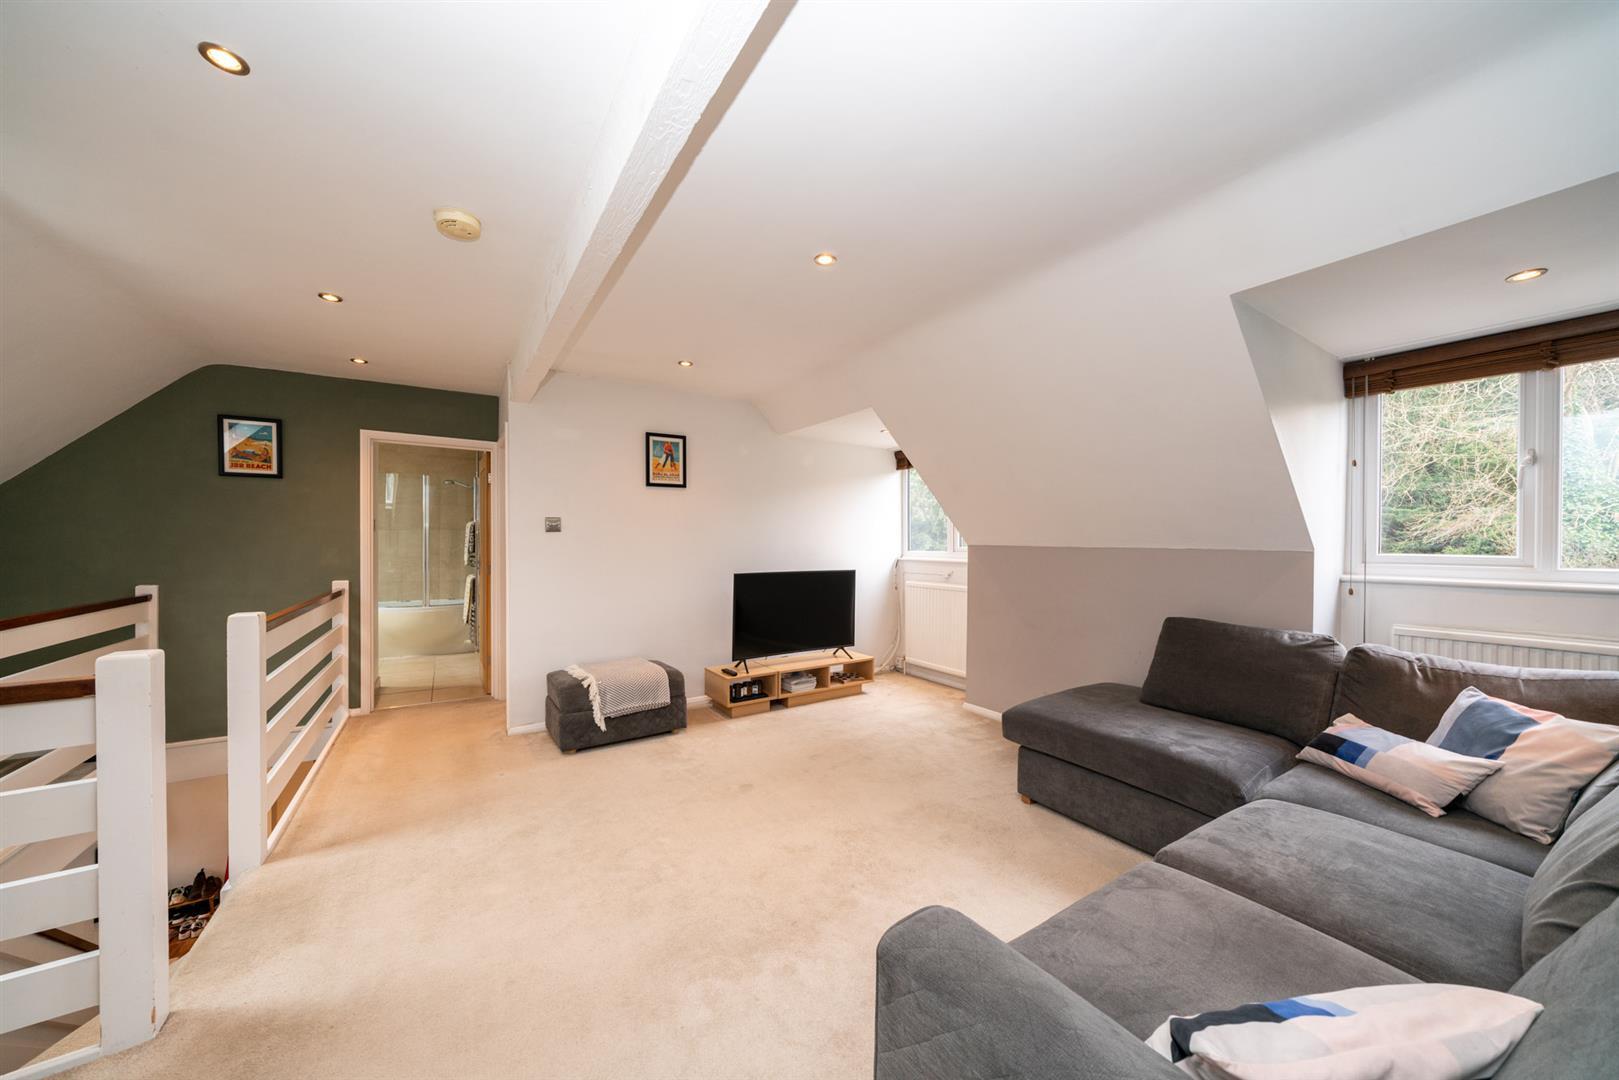 Flat-6-Ruscoe-5102 - living room.jpg